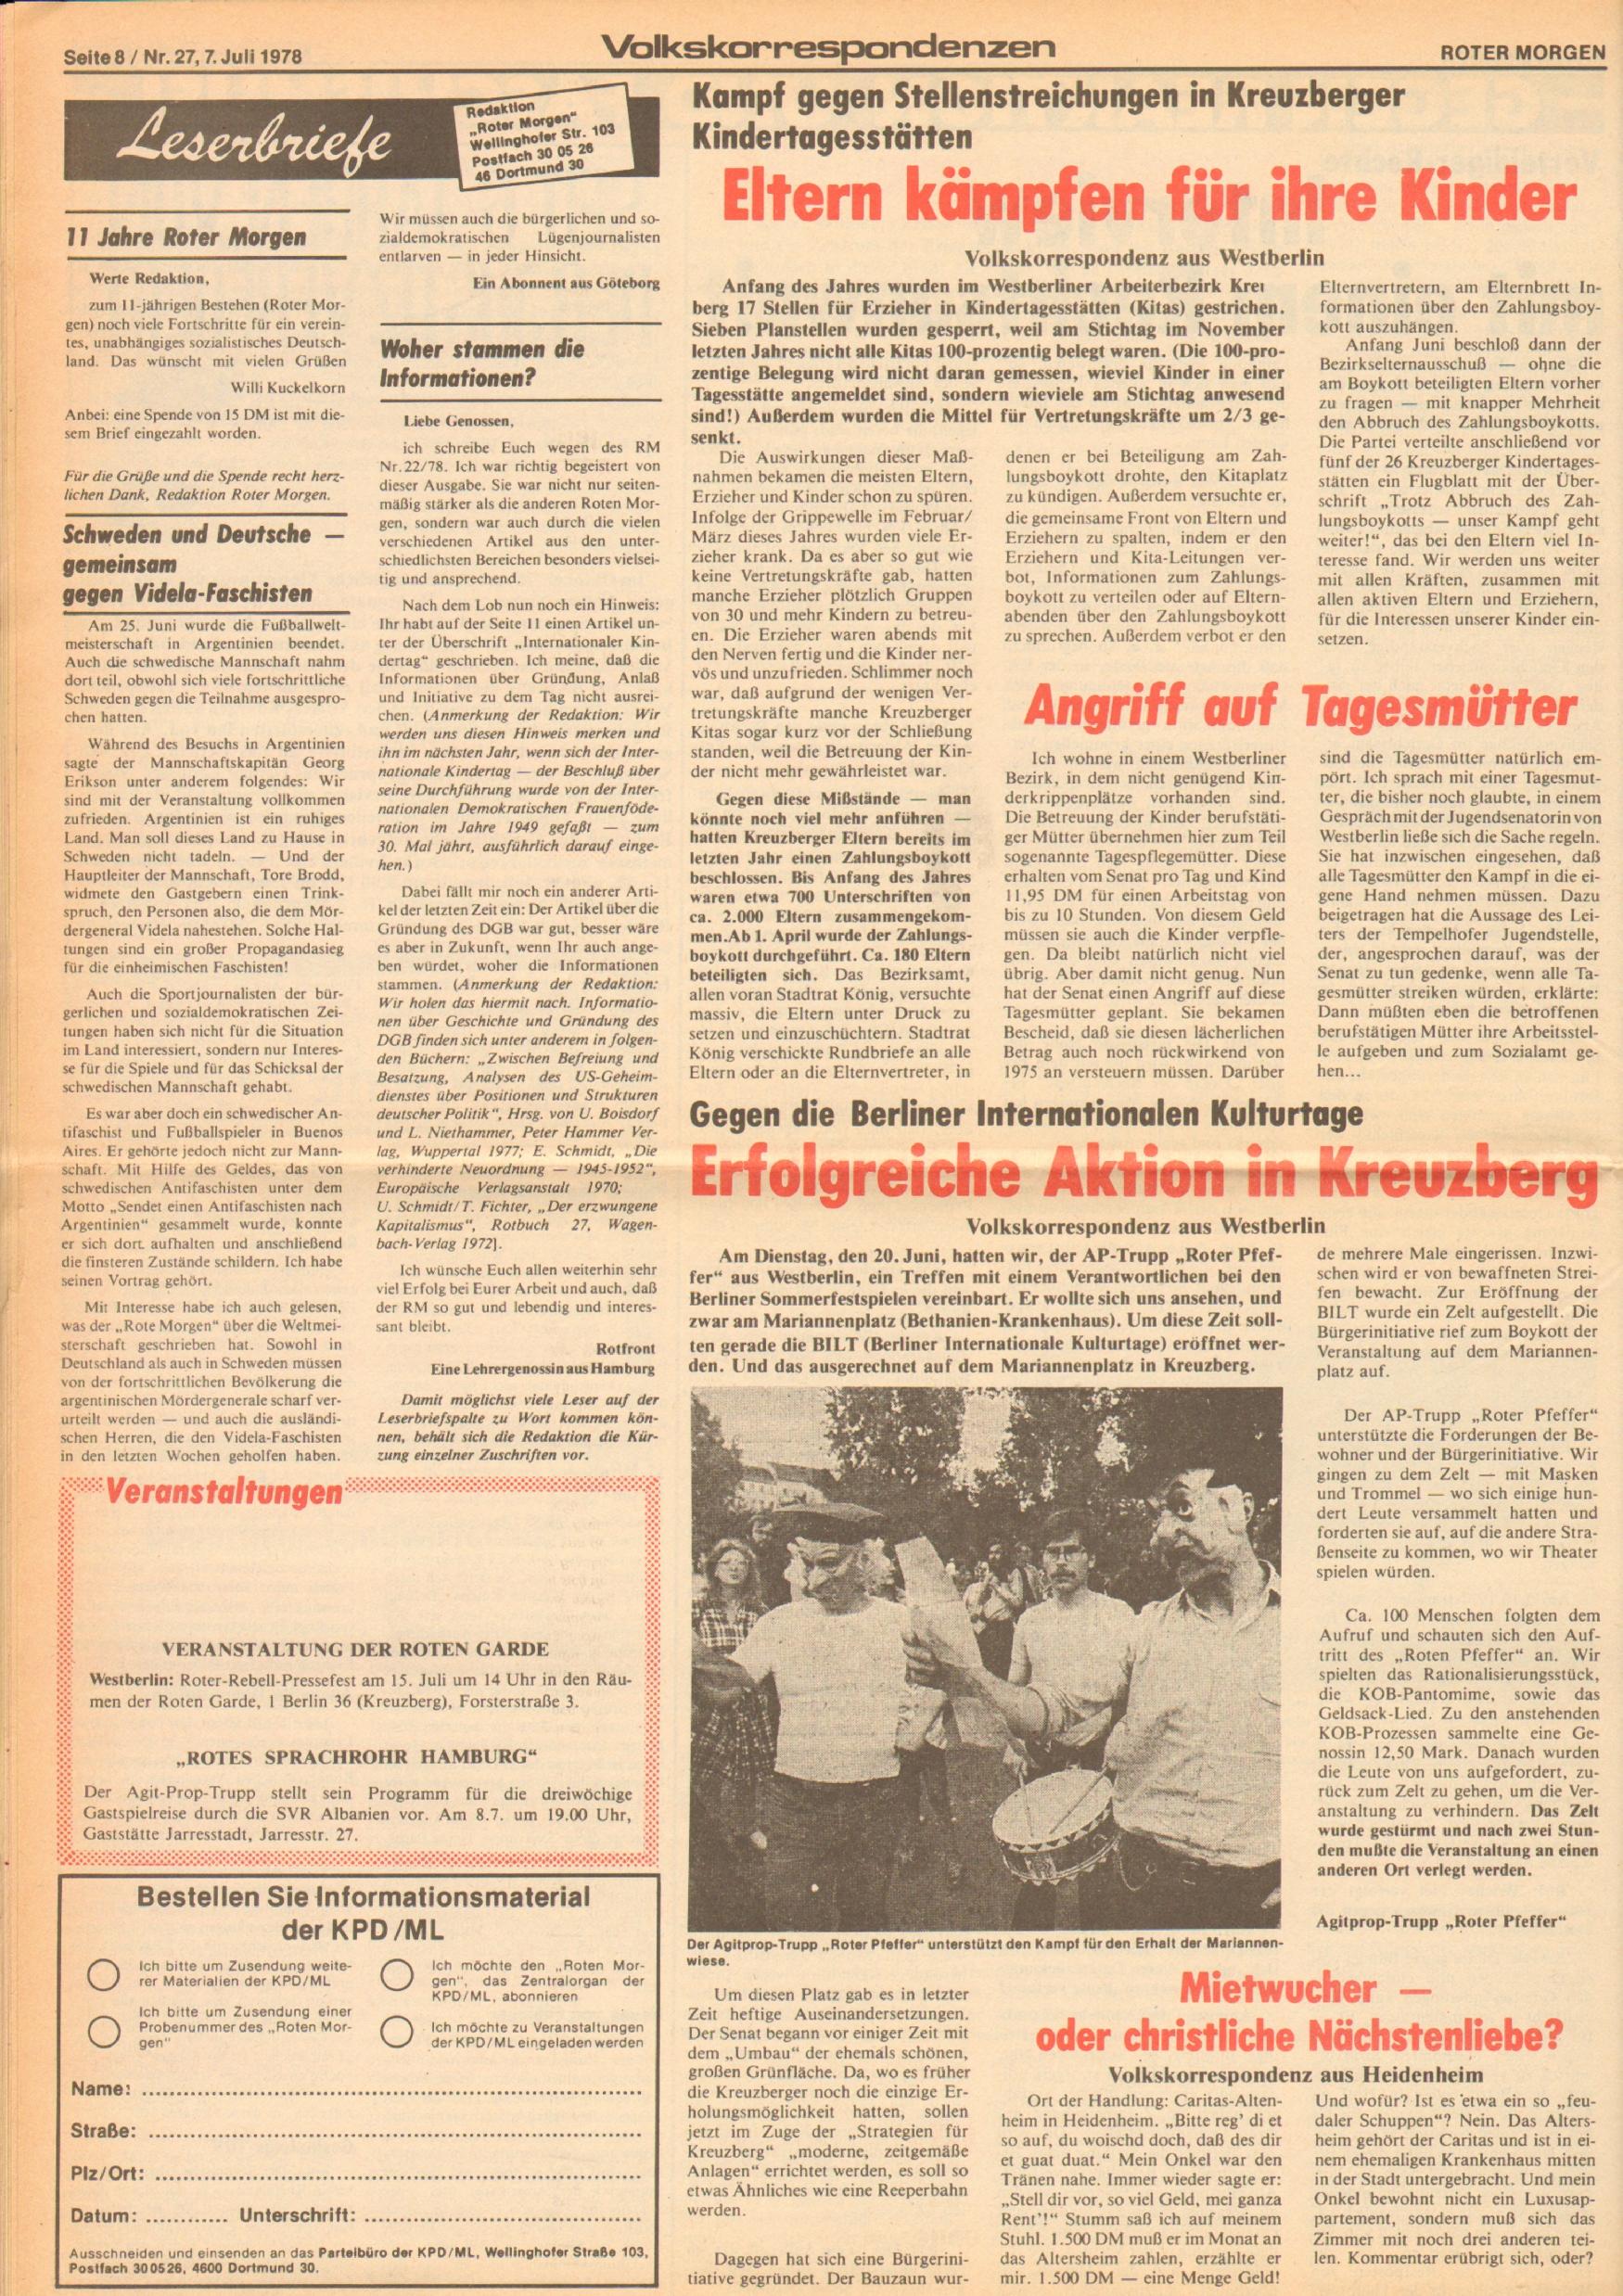 Roter Morgen, 12. Jg., 7. Juli 1978, Nr. 27, Seite 8